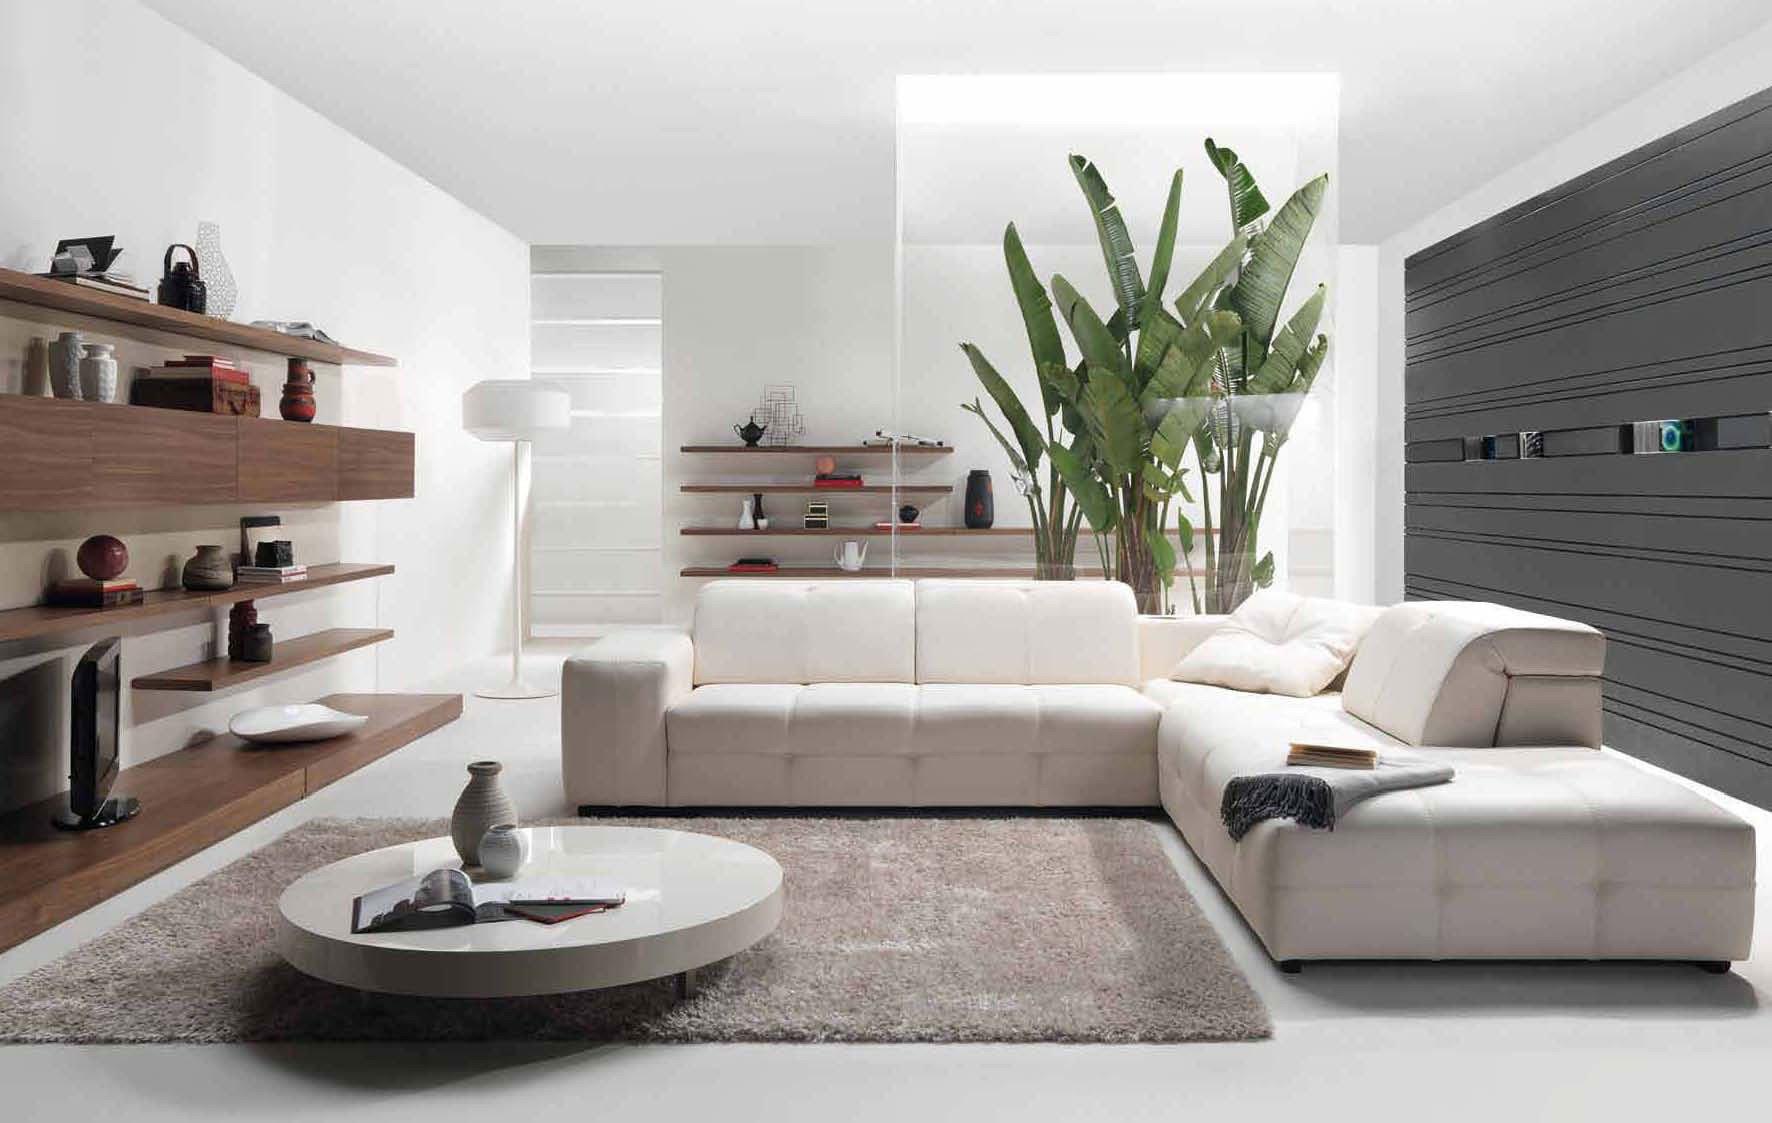 Living Room Ideas Contemporary Best Of 25 Best Modern Living Room Designs